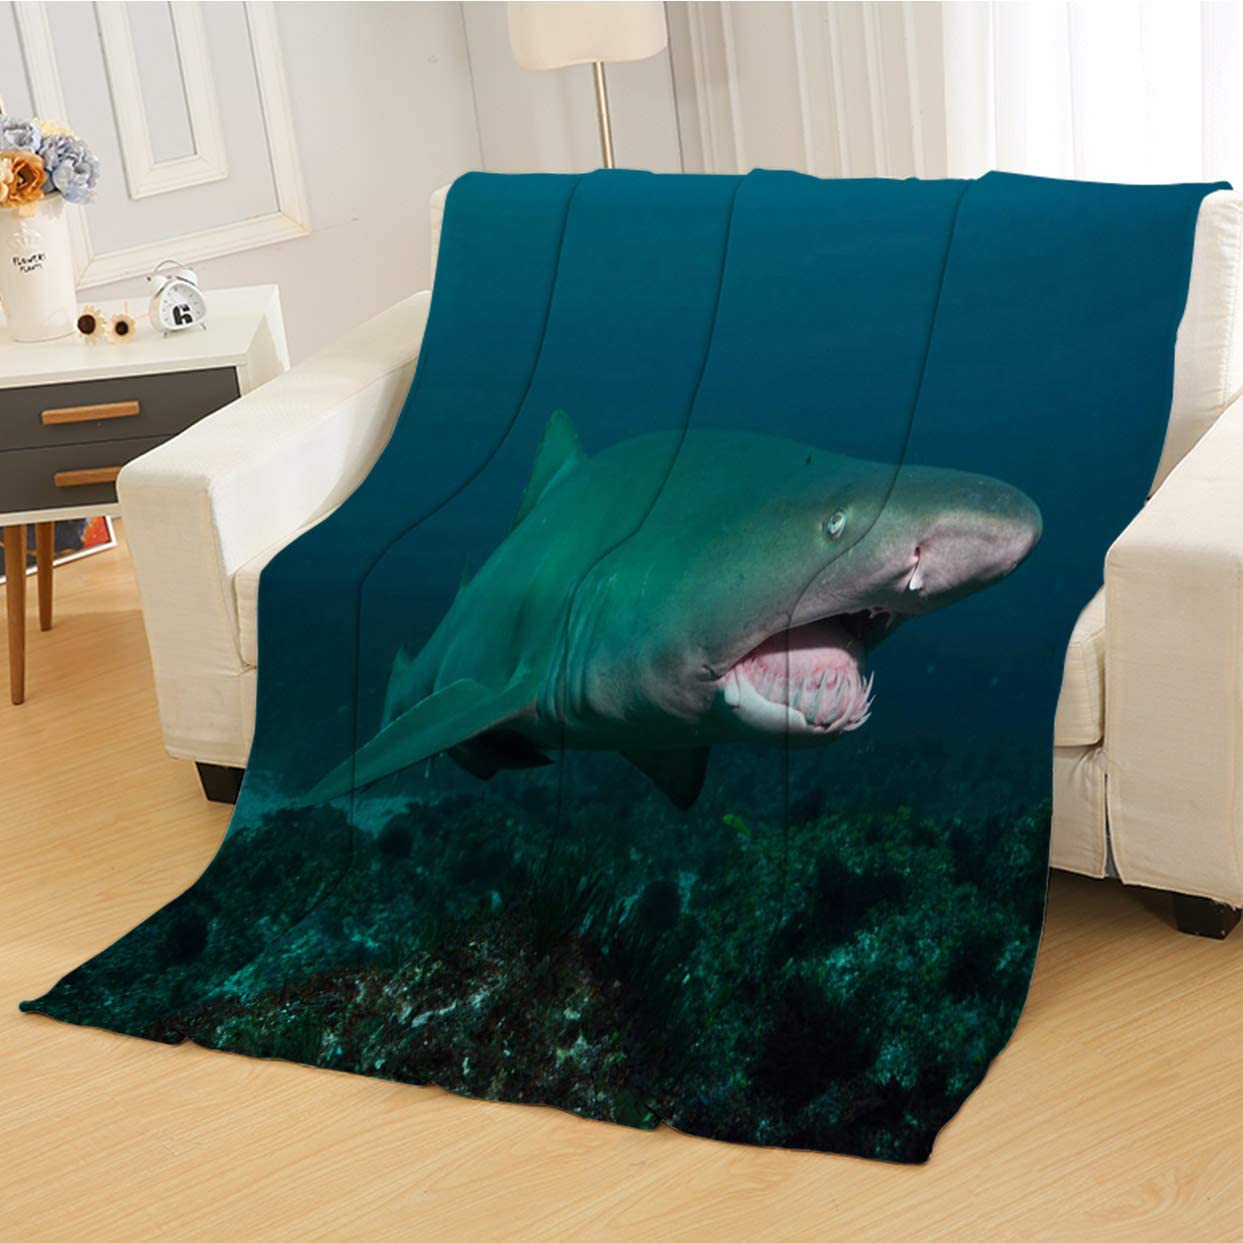 RLDSESS Shark Warm Baby Bed Blanket, All Season Blanket,Grey Nurse Shark Tweed Heads New South Wales Australia,Soft Weighted Blanket,Baby Size: 31Wx47L inch